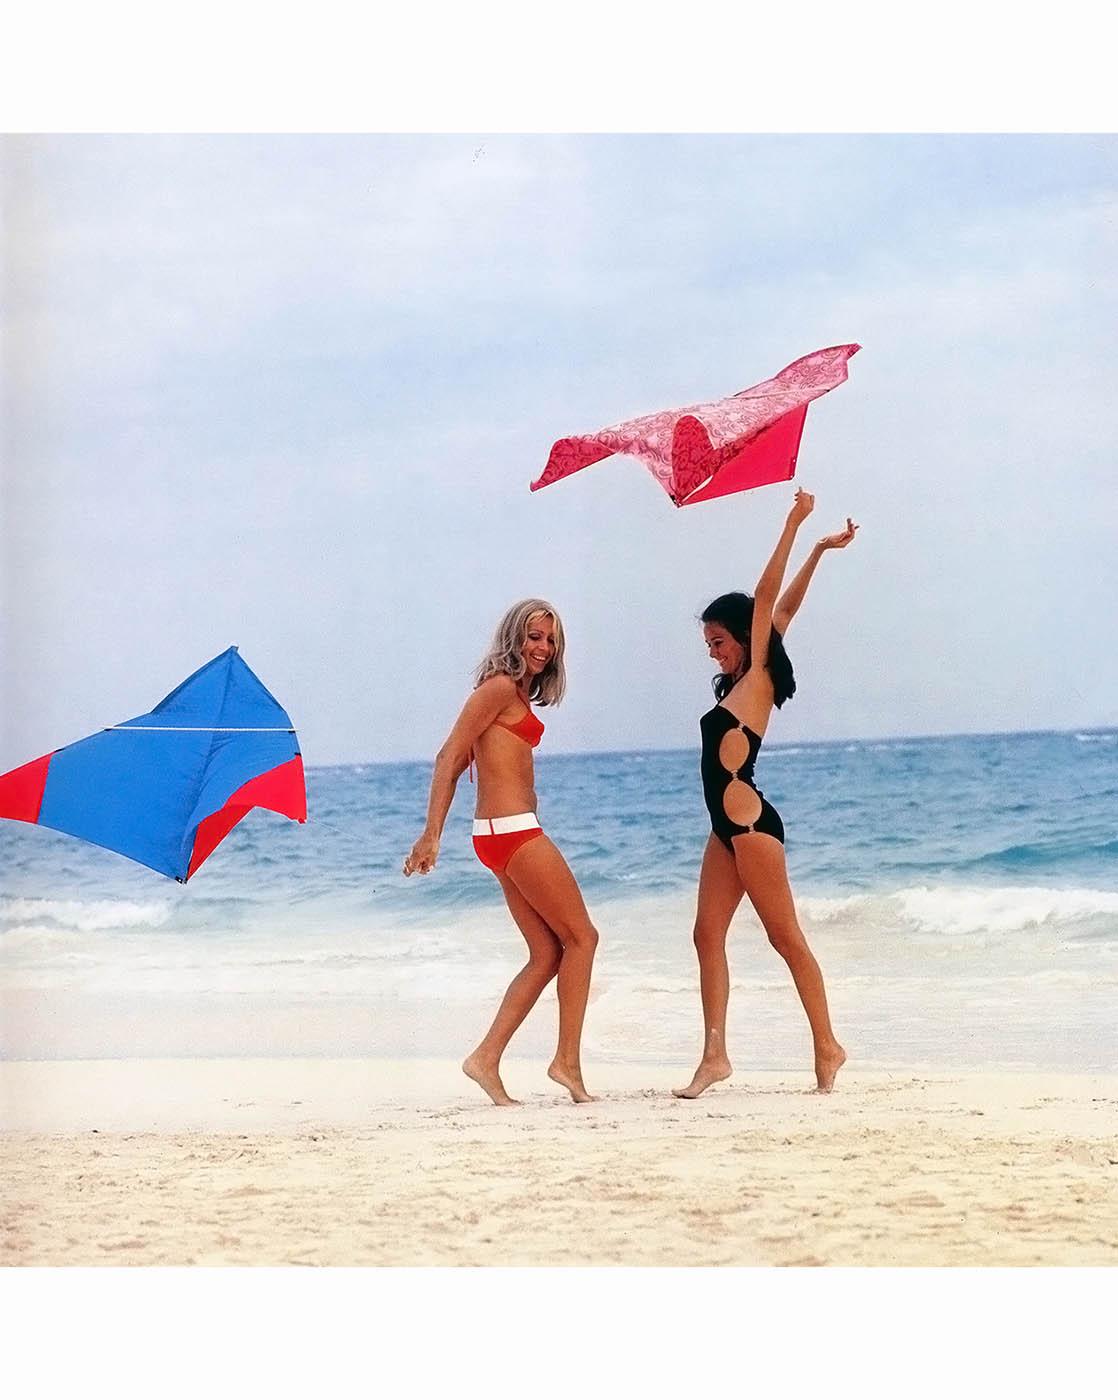 https://pleasurephoto.files.wordpress.com/2015/12/swimsuit-fashionsfor-time-bermuda-1968-ormond-gigli.jpg